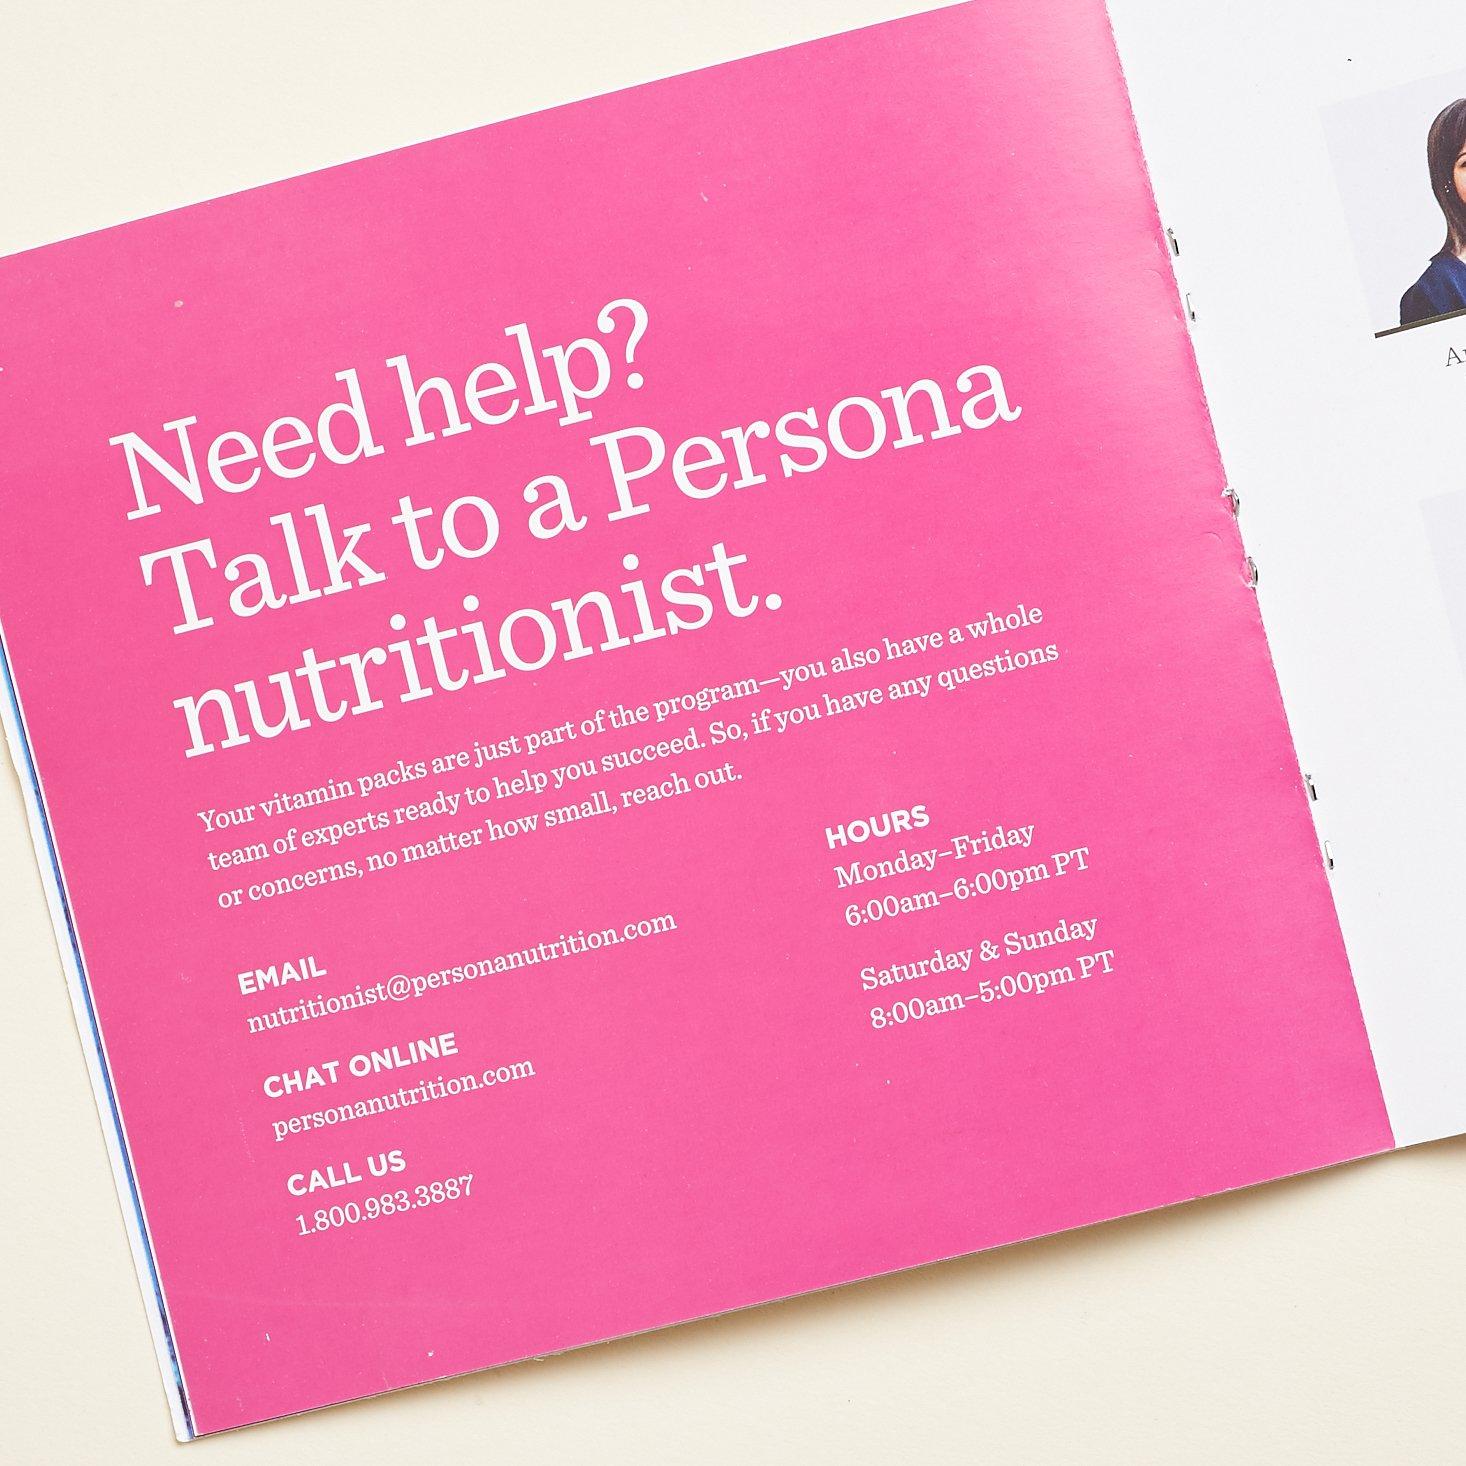 Description of nutritionists help